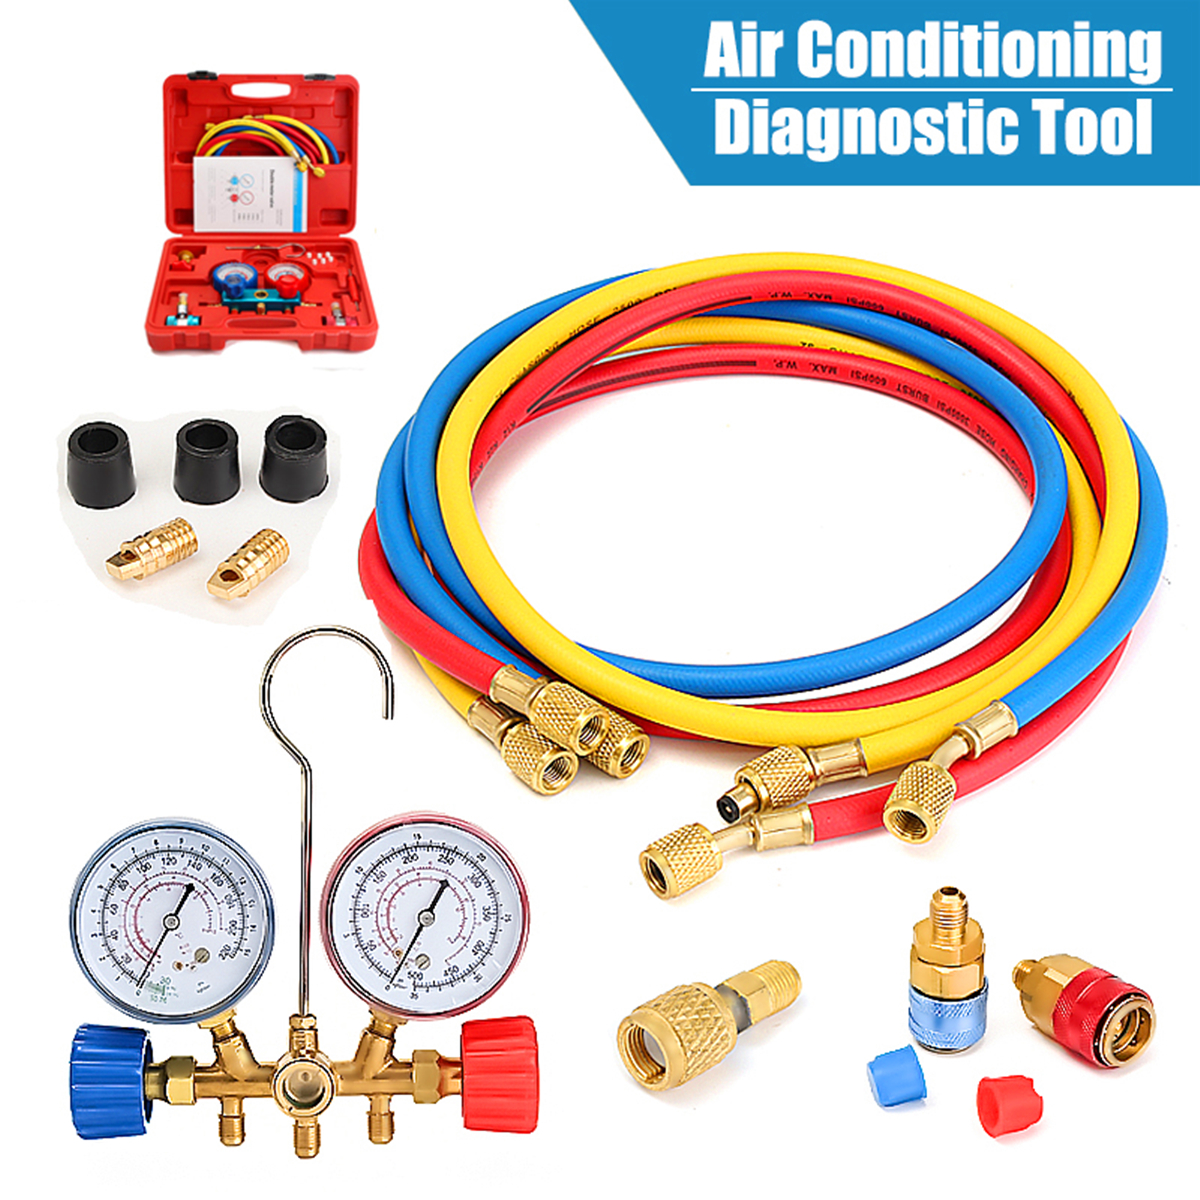 HVAC A/C Refrigeration Kit Manifold Gauge Set For R22 R12 R134A Auto Refrigerant H/L Quick Coupler Tool Sets Manifold Gauge Kit